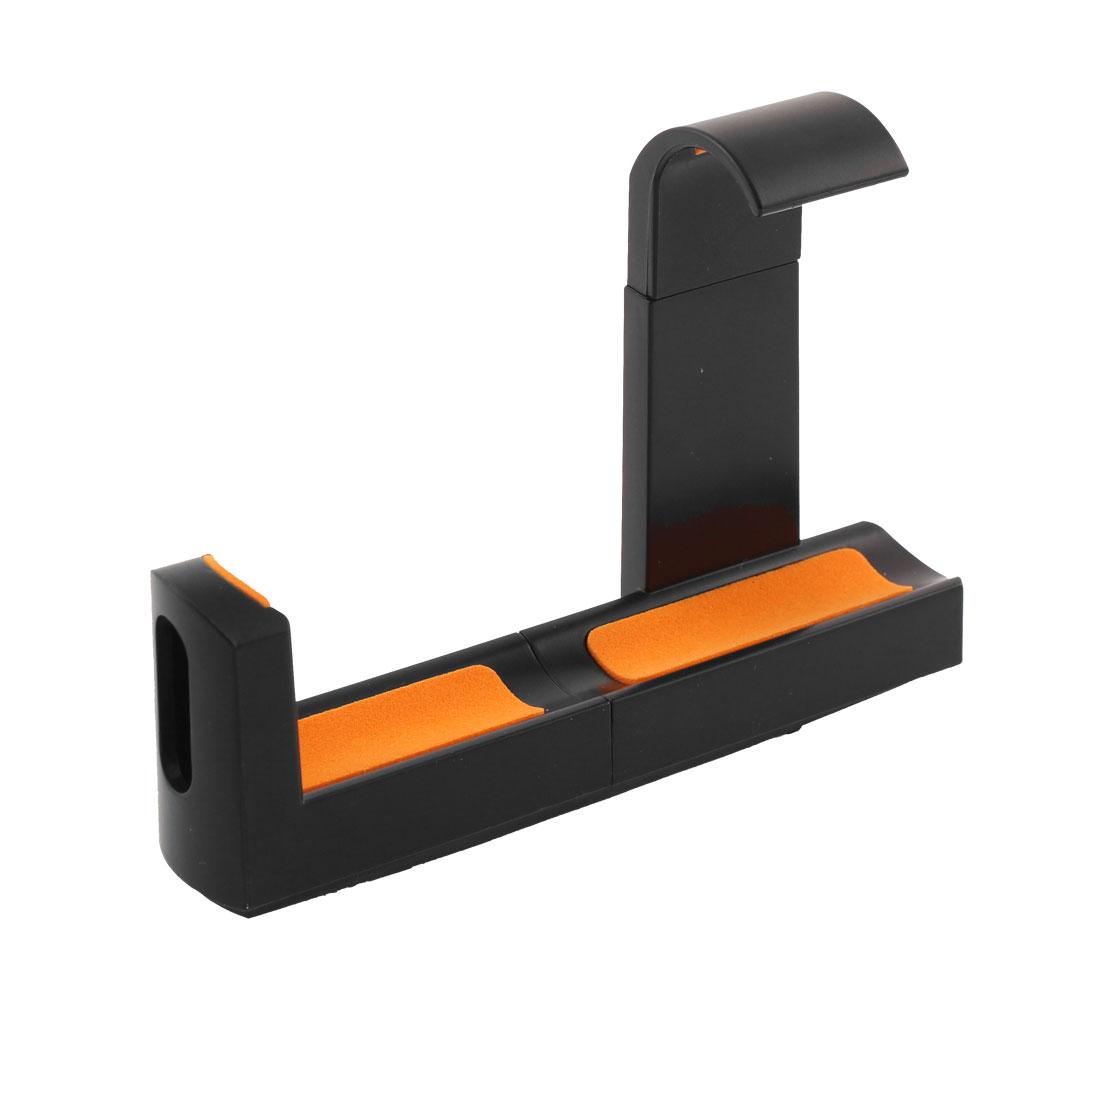 Black Holder Clip Mount Bracket for Mobile Phone iPhone 6 5S